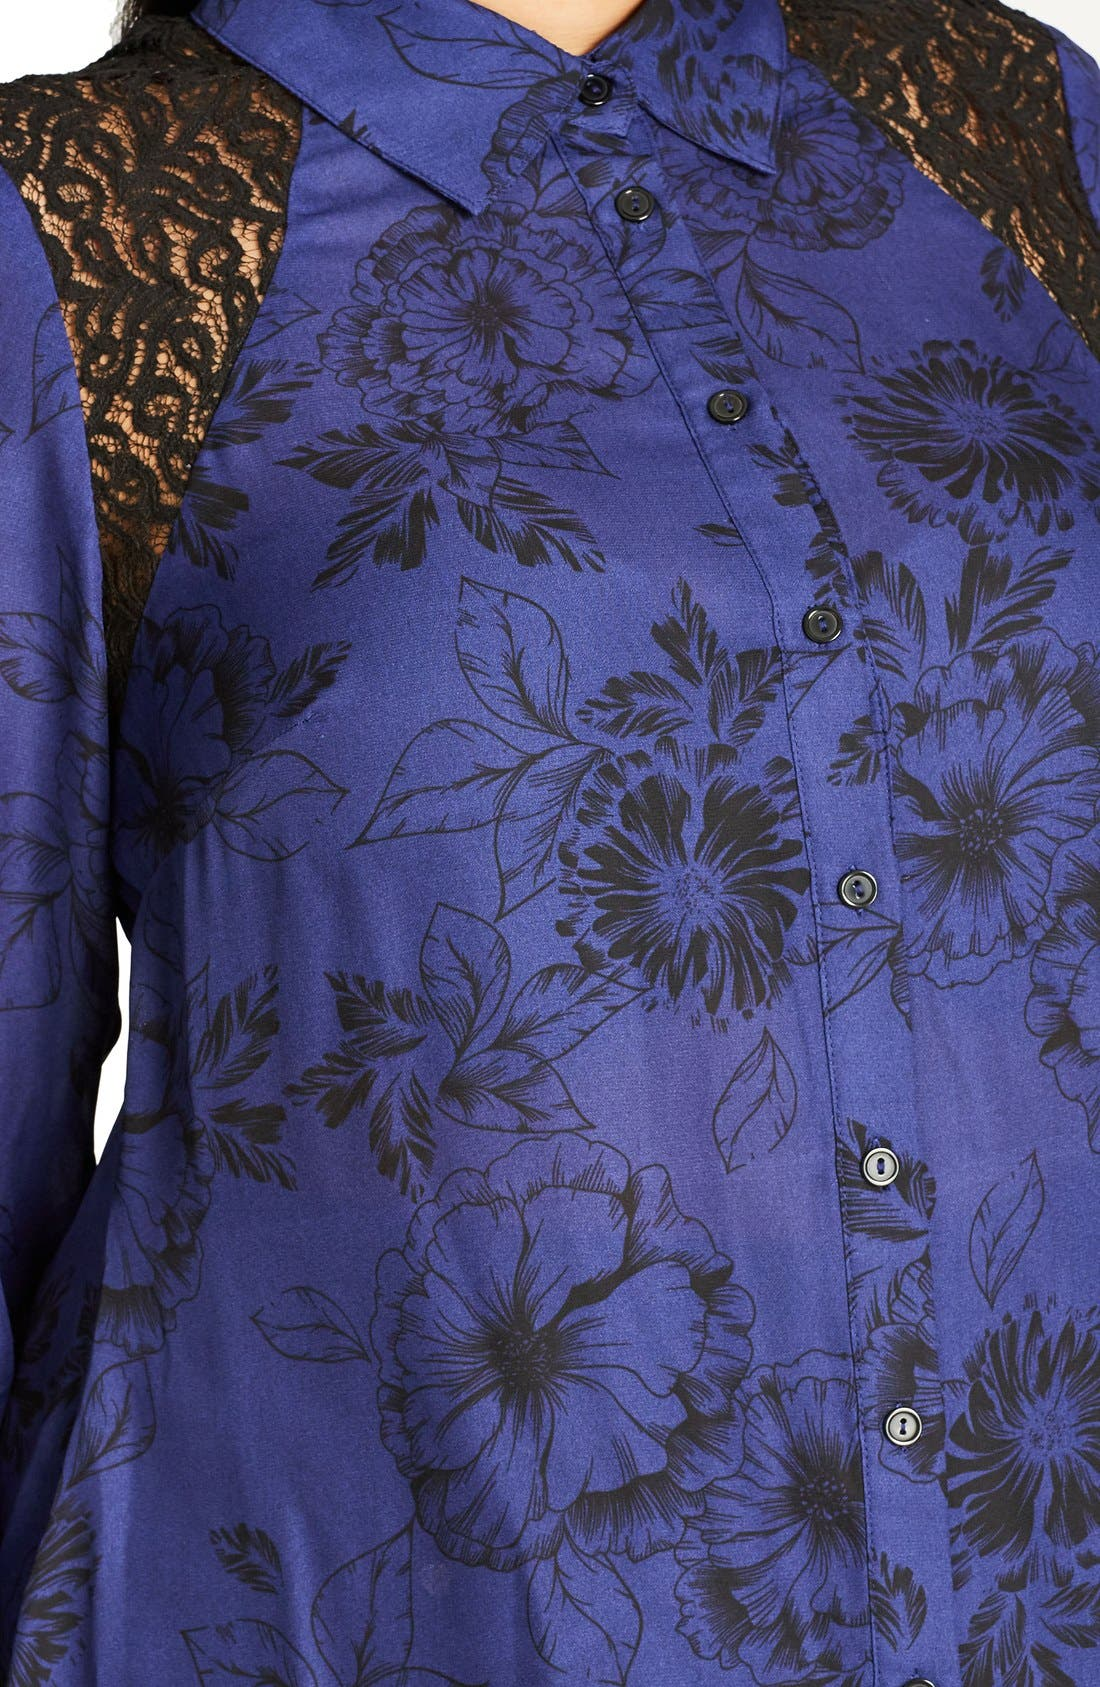 Des Fleurs Back Keyhole Shirt,                             Alternate thumbnail 8, color,                             407